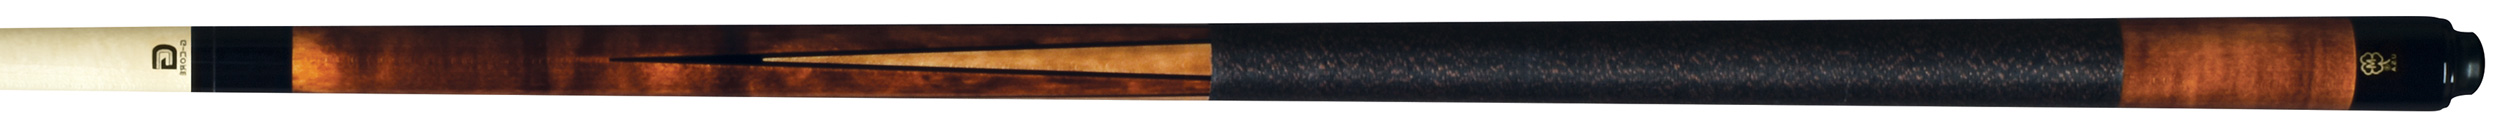 Mcdermott g239-piljardikii